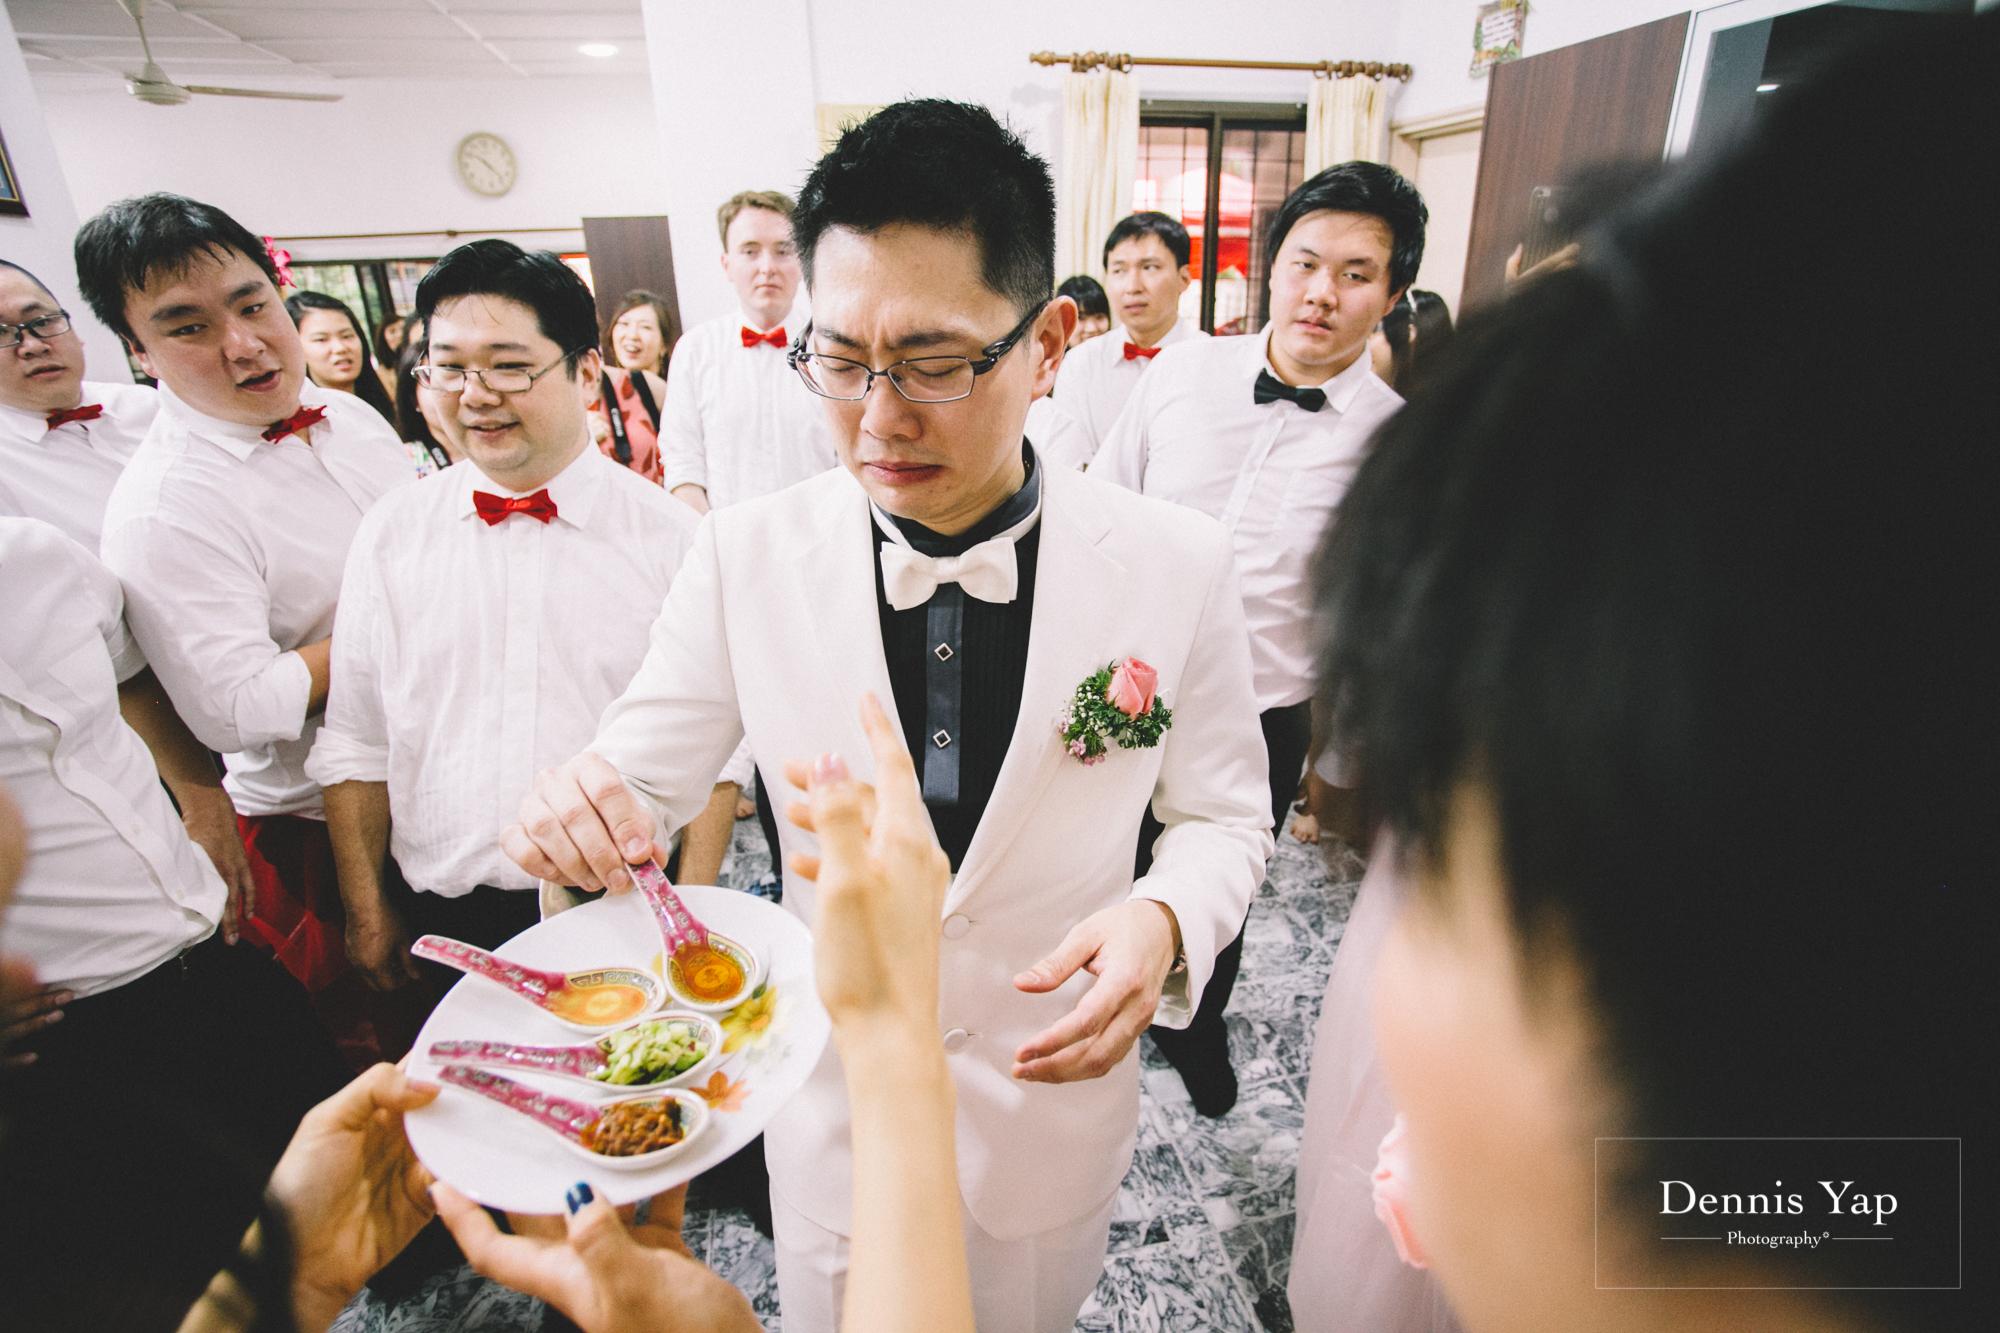 alex shir ley wedding day gate crash subang jaya usj dennis yap photography moments-11.jpg